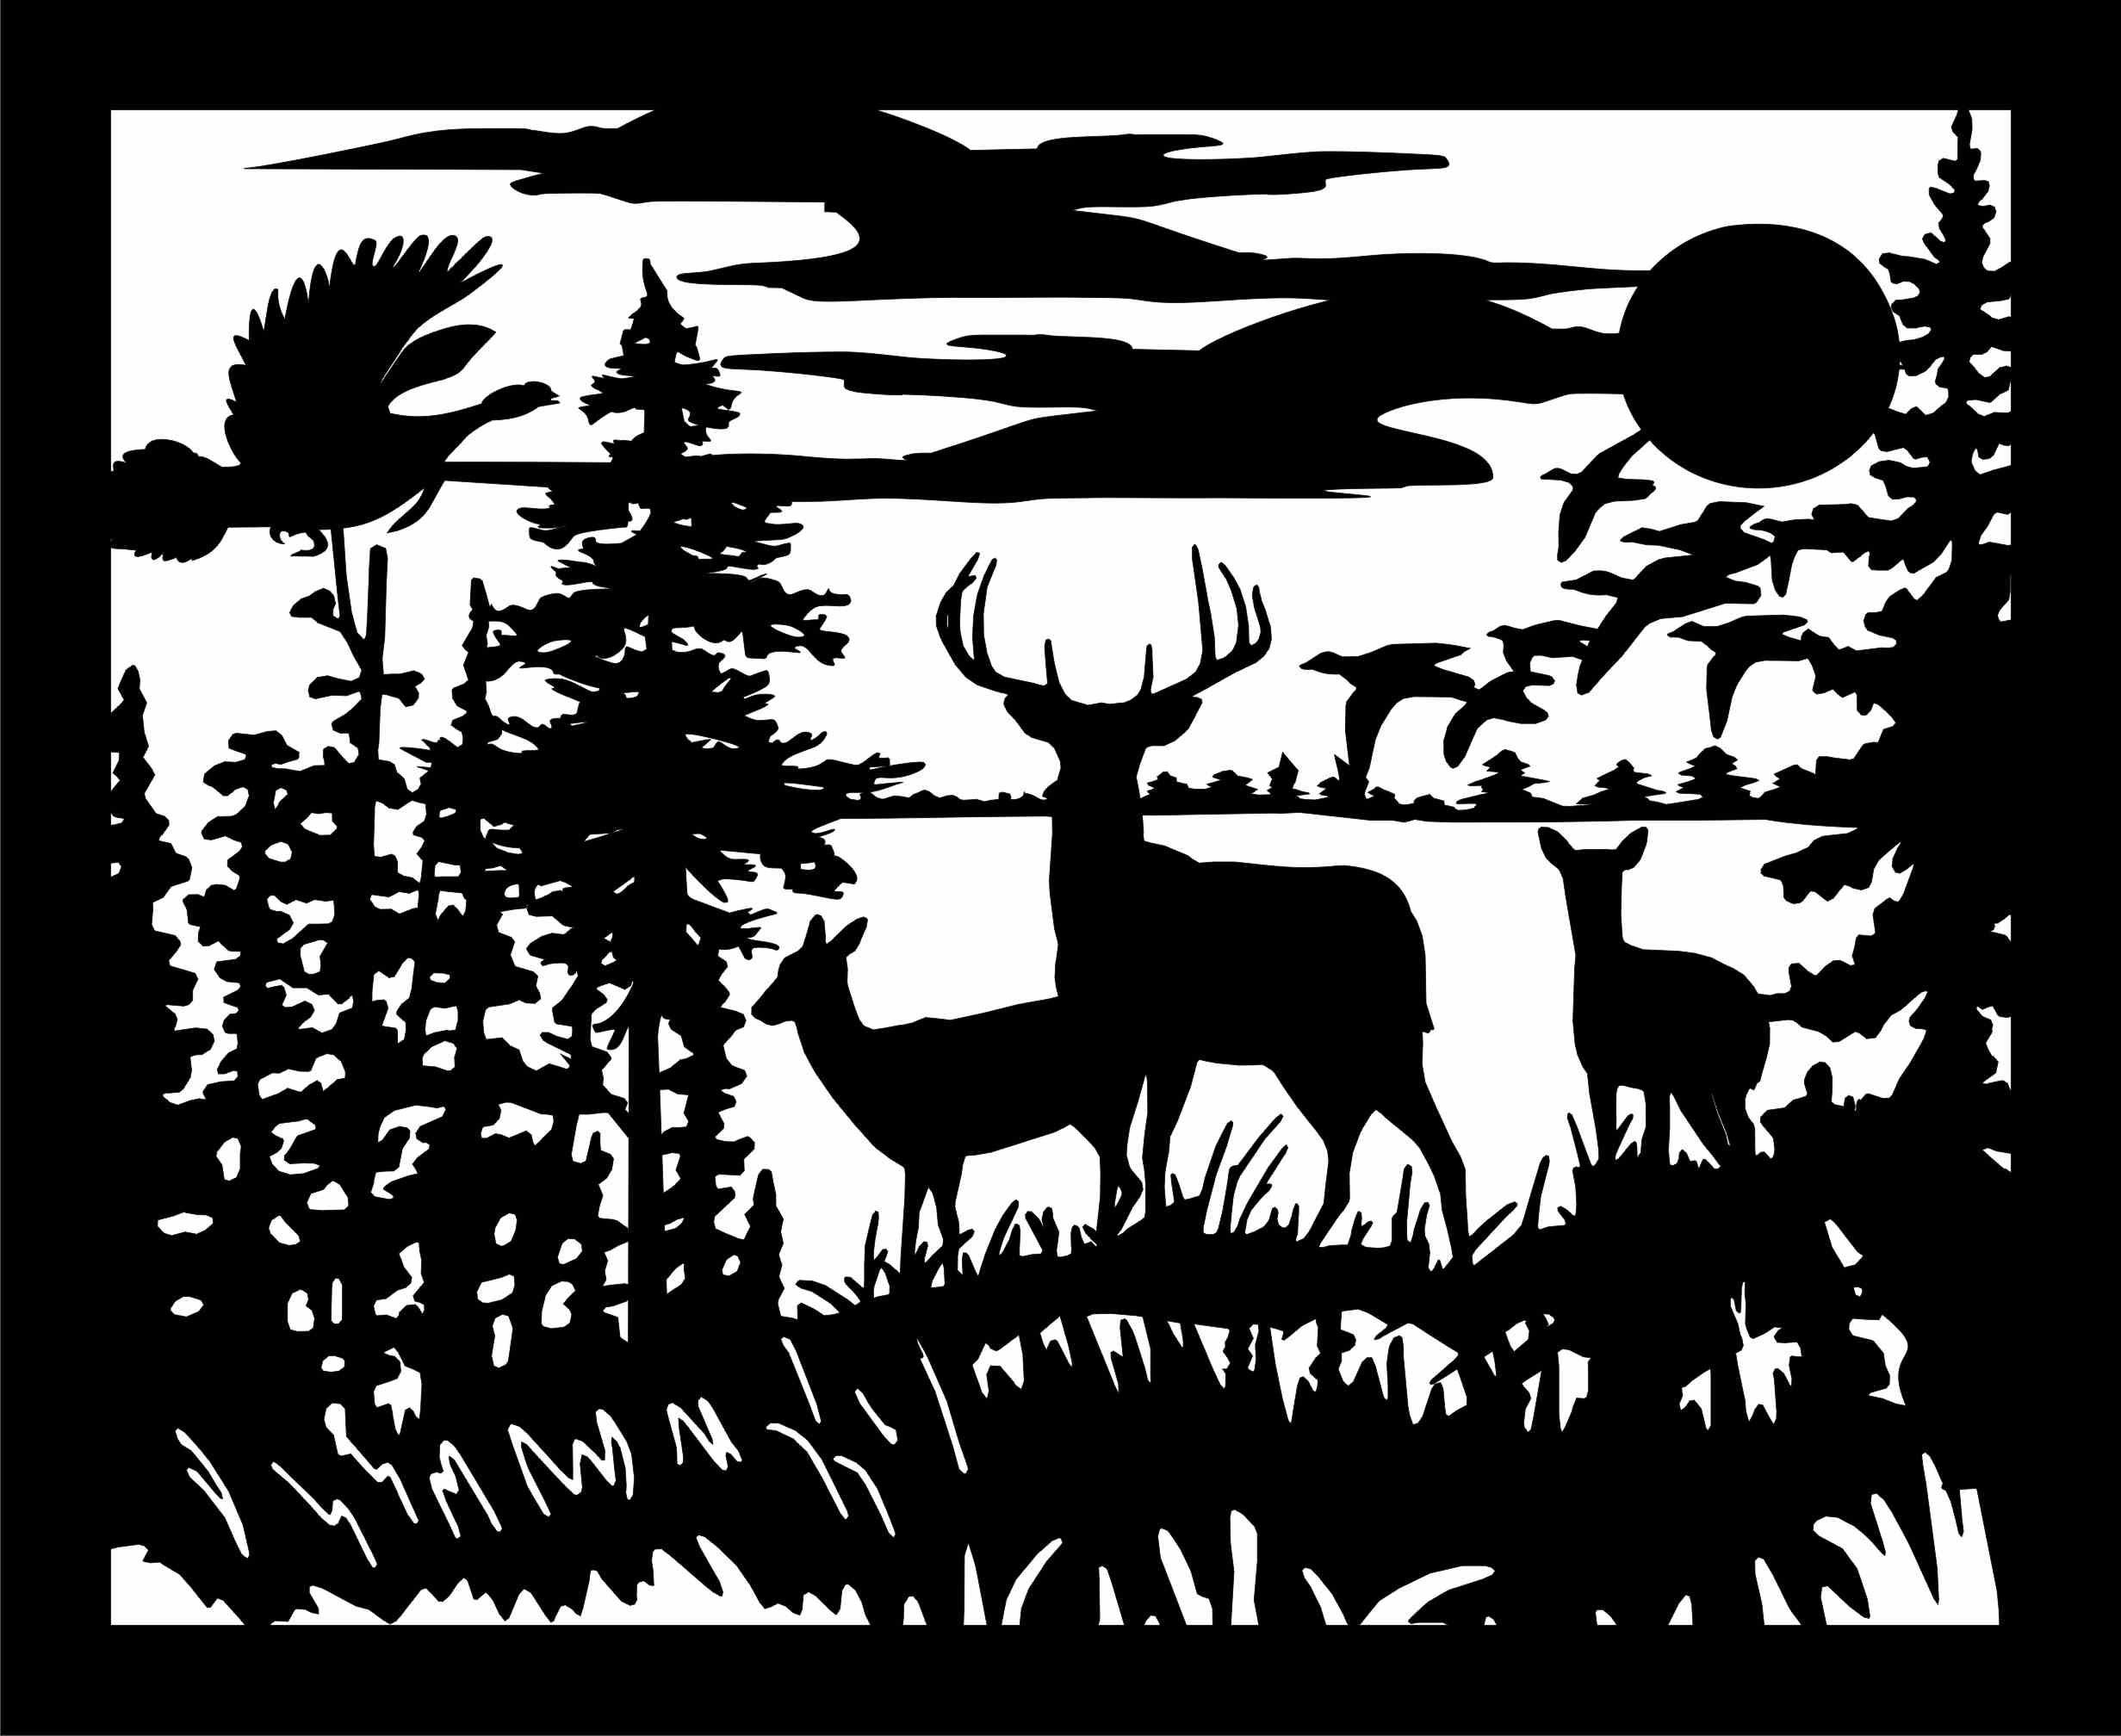 Farm Scene Silhouette Signs,   Stalegrafika  Pinterest. Courageous Signs Of Stroke. Dark Side Signs Of Stroke. Snow White Signs. Possessiveness Signs Of Stroke. Lower Respiratory Signs. Depressive Disorder Signs. Shin Signs. Equality Signs Of Stroke